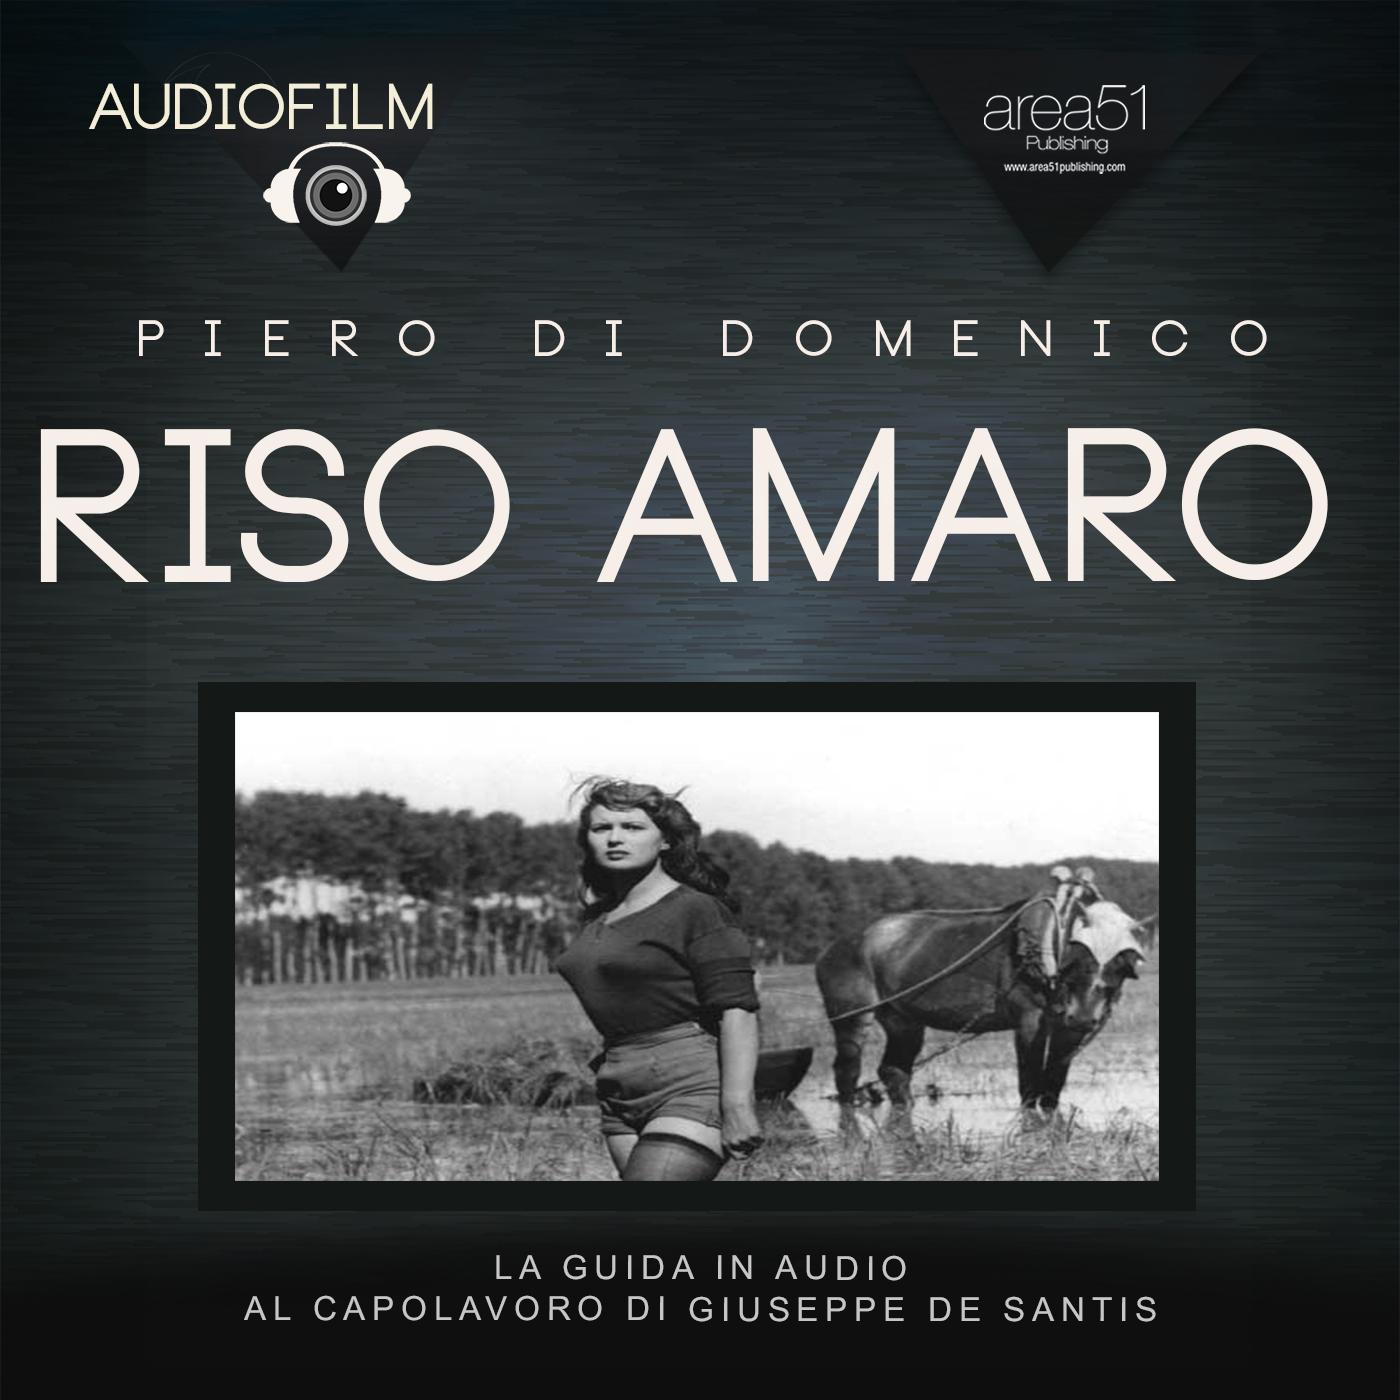 Riso amaro di Giuseppe De Santis (1949). Audiofilm.-0